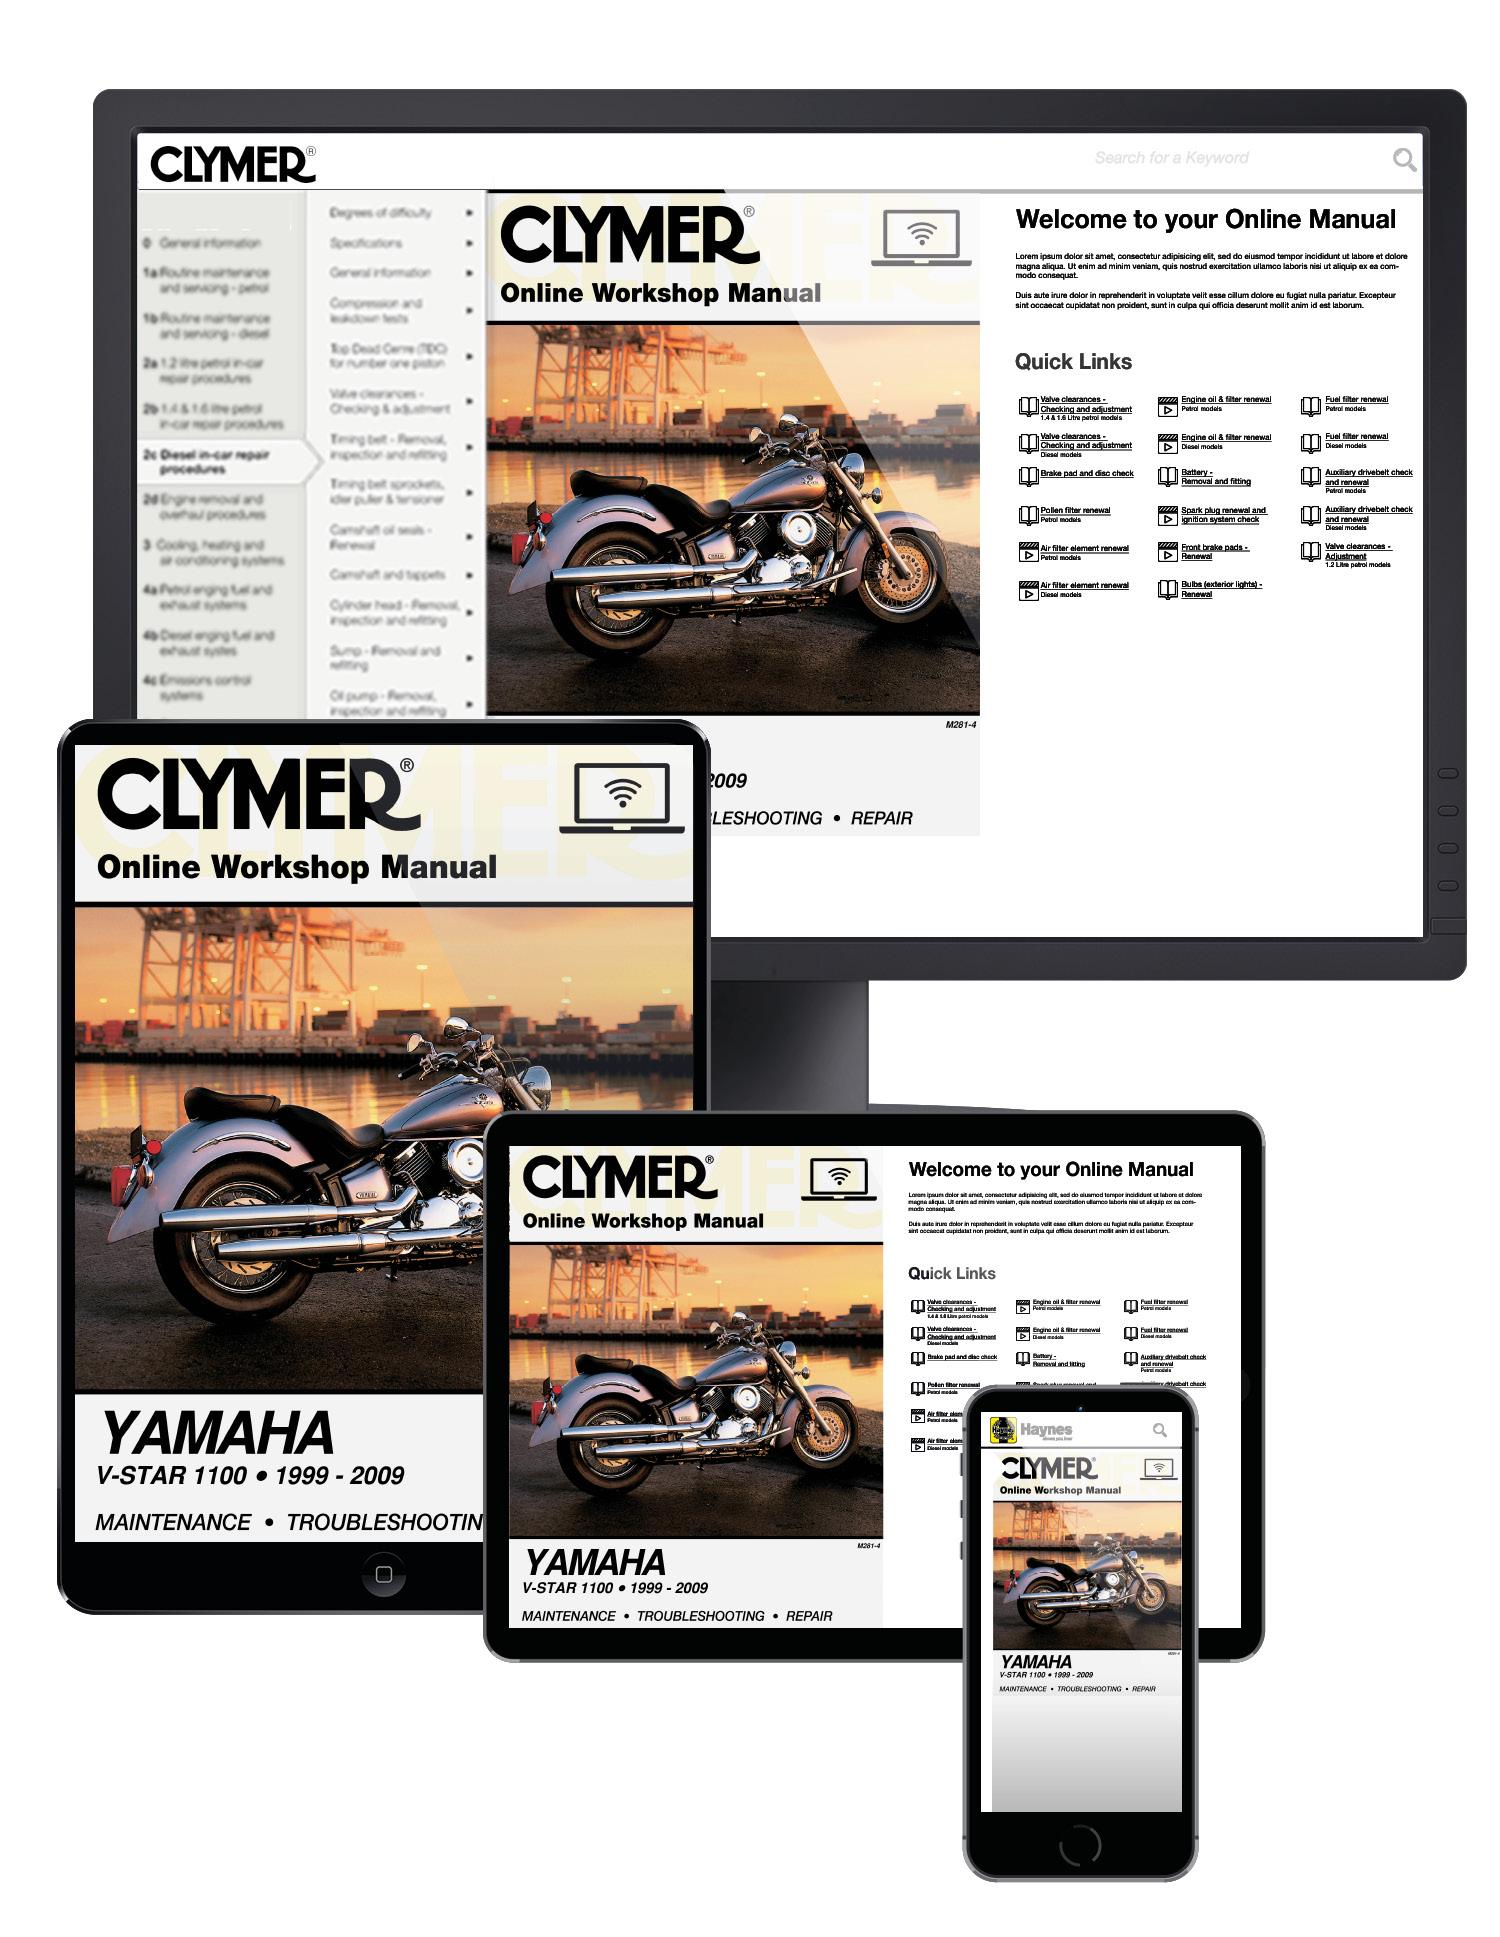 Yamaha V-Star 1100 Series Motorcycle (1999-2009) Service Repair Manual Online Manual